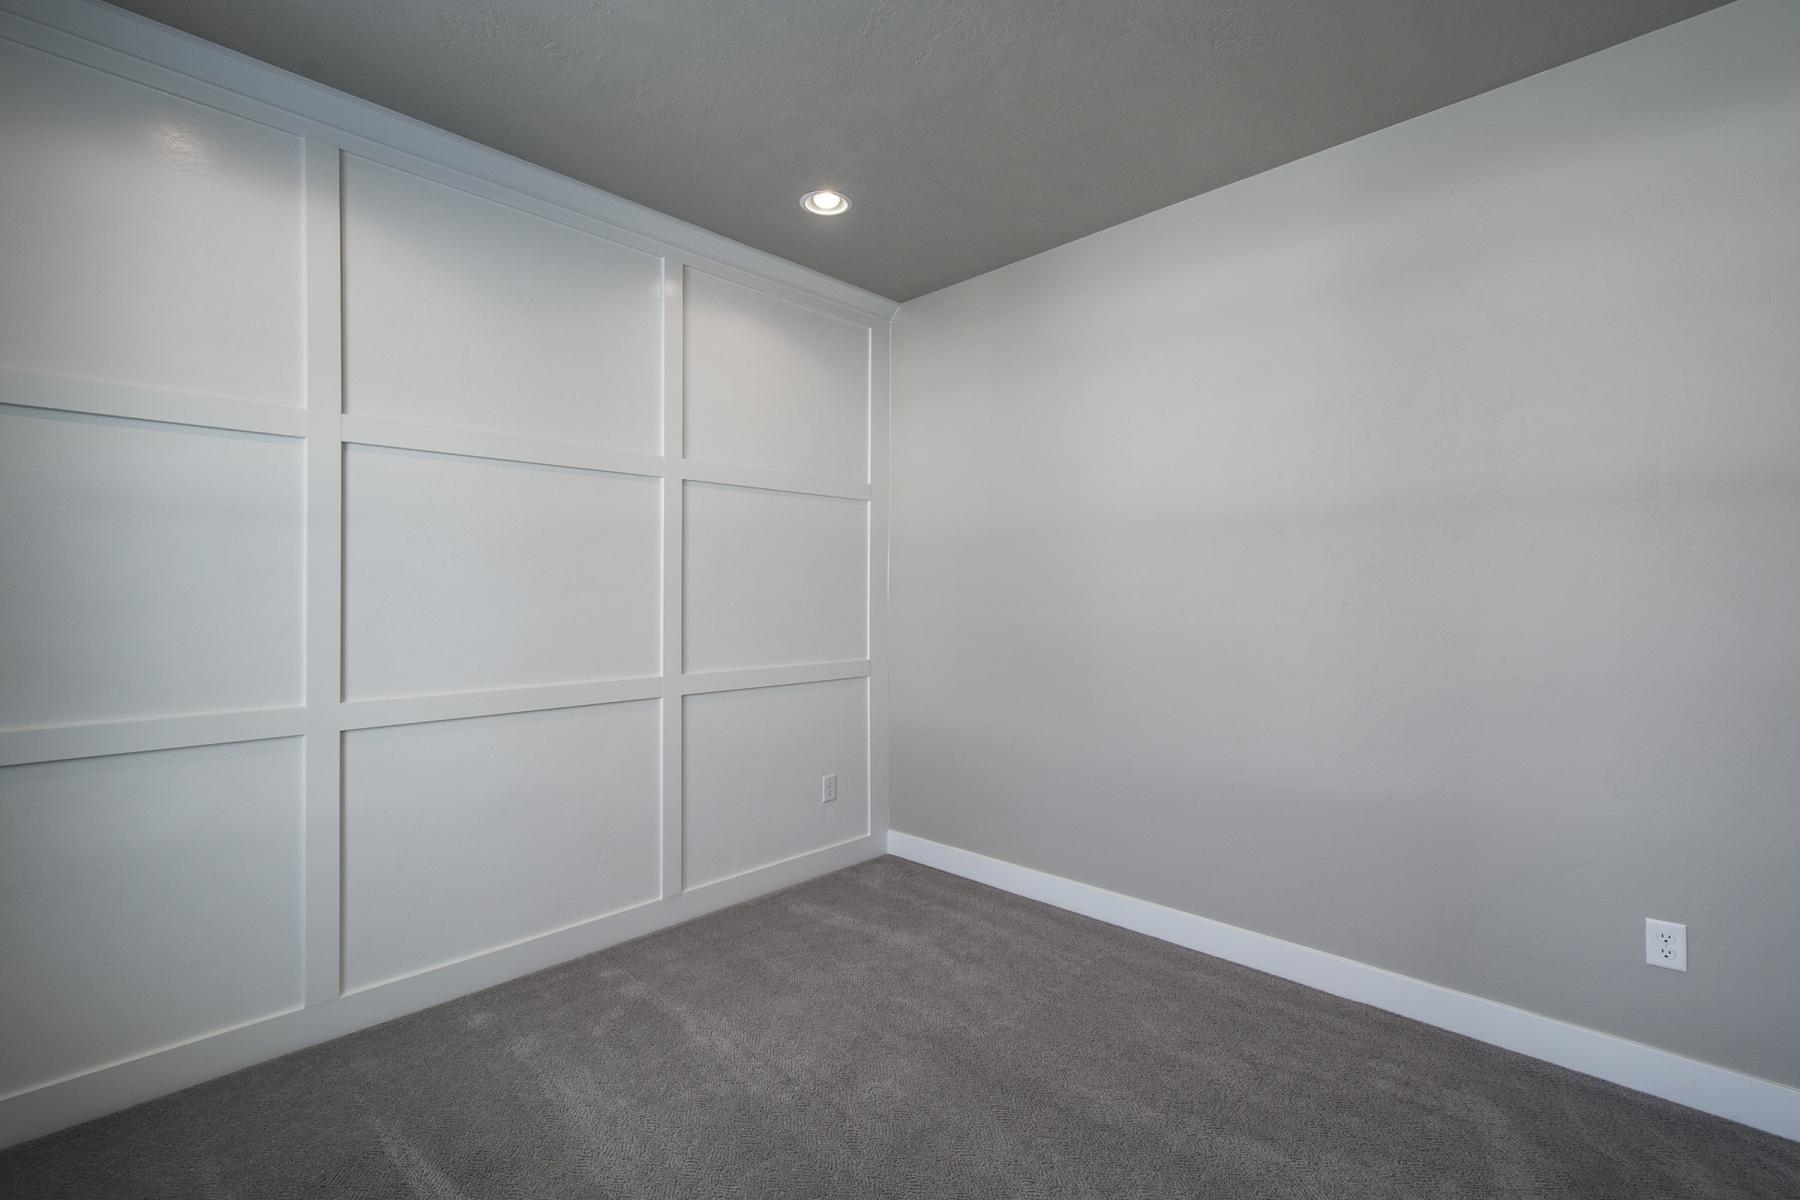 livingroom_1800x1200_2565959